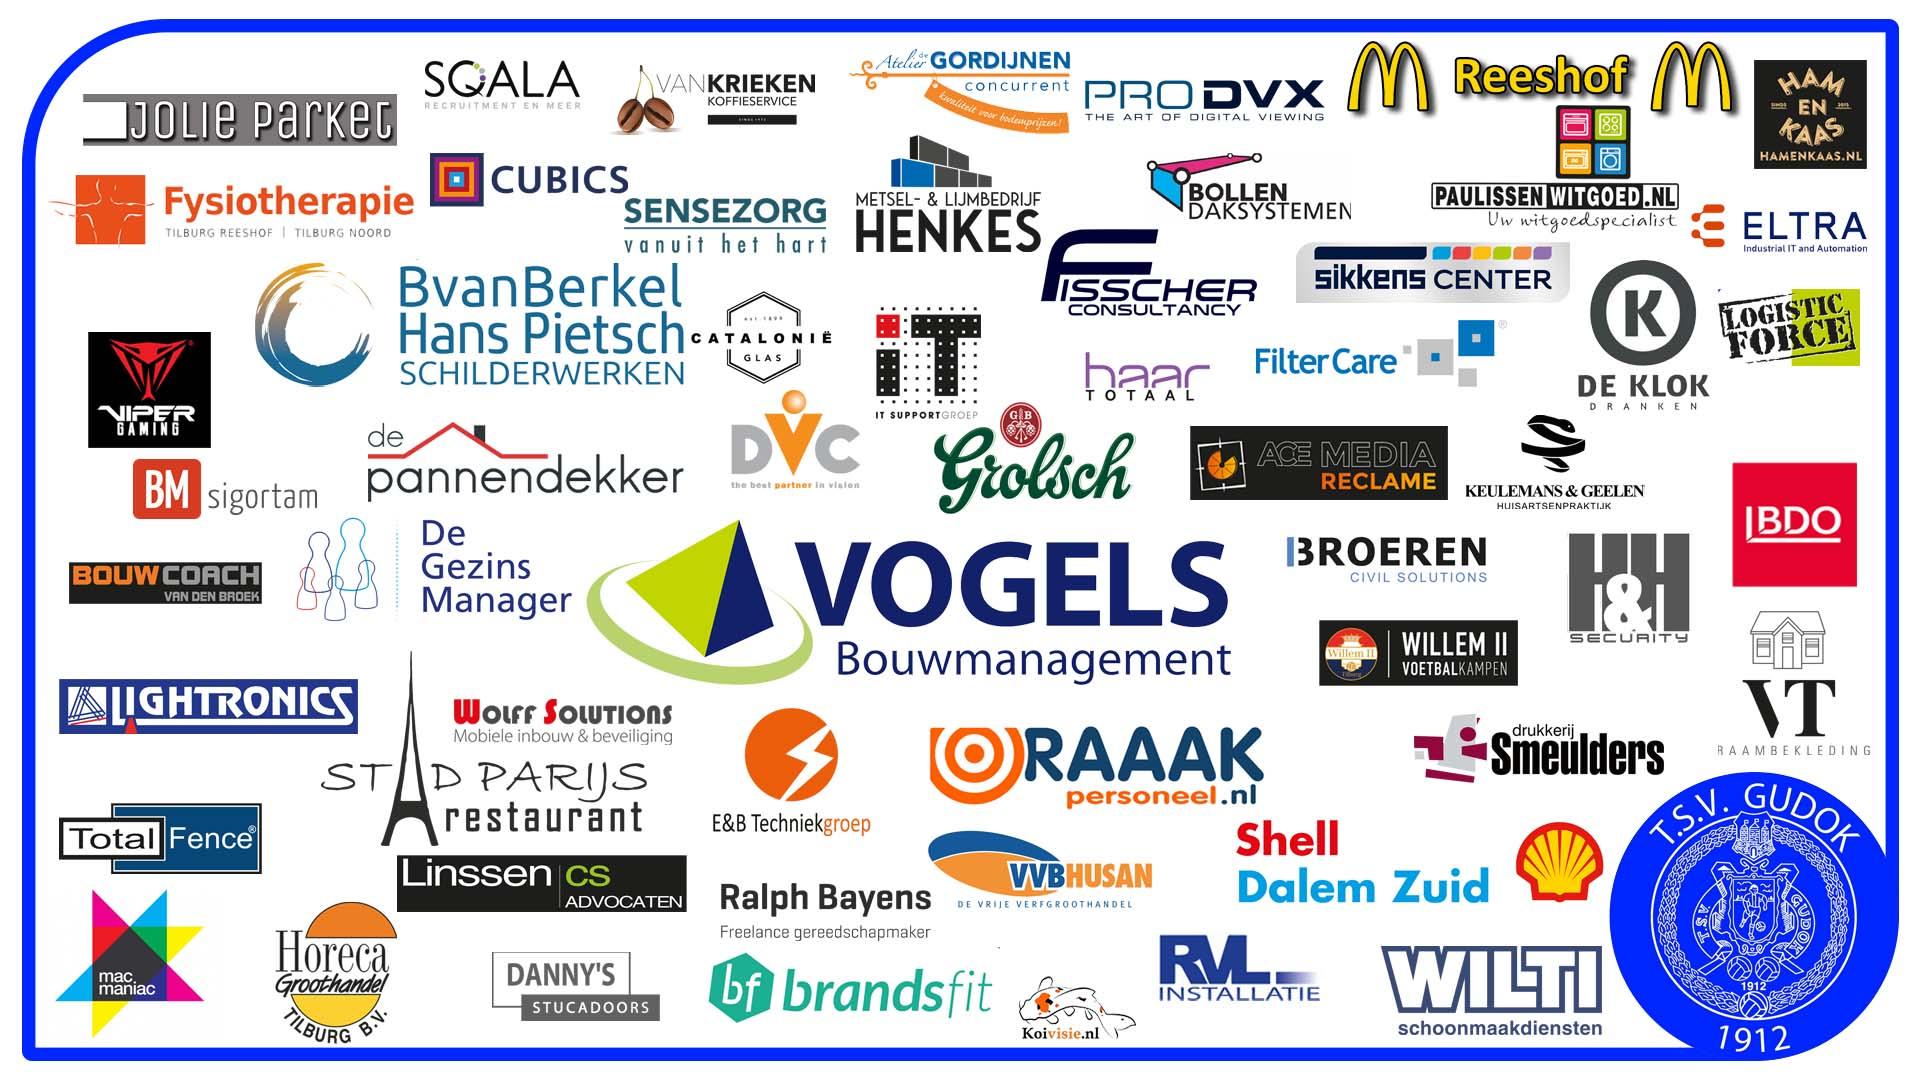 Steun onze sponsoren !!